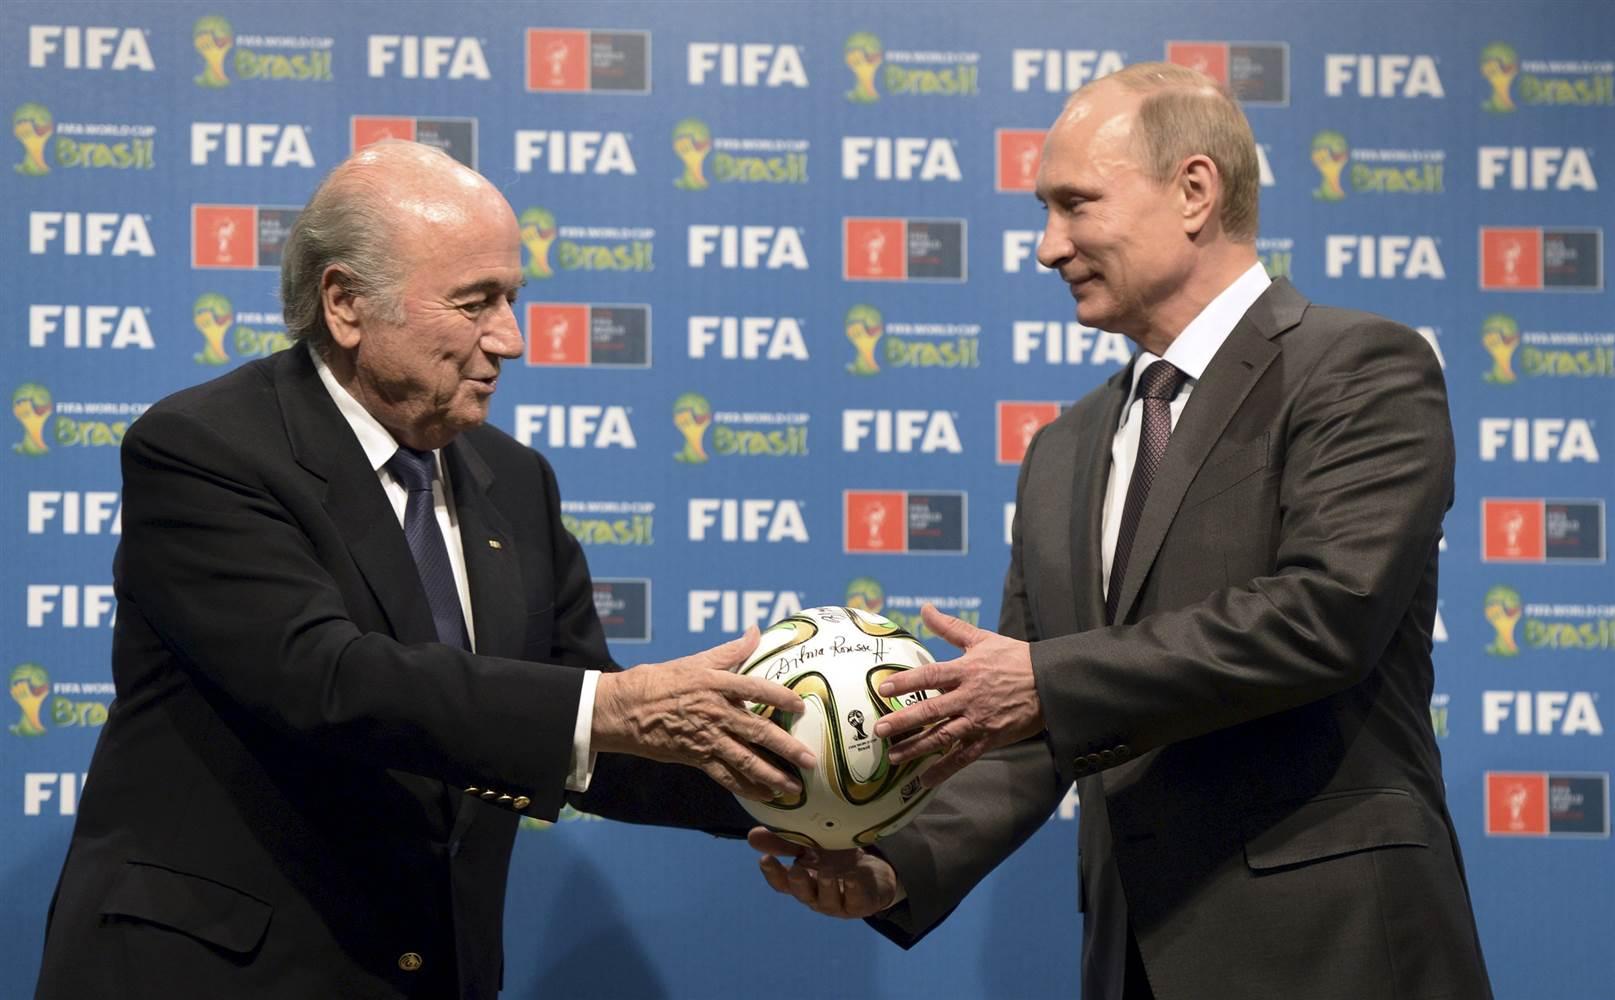 blatter putin FIFA world cup scandal